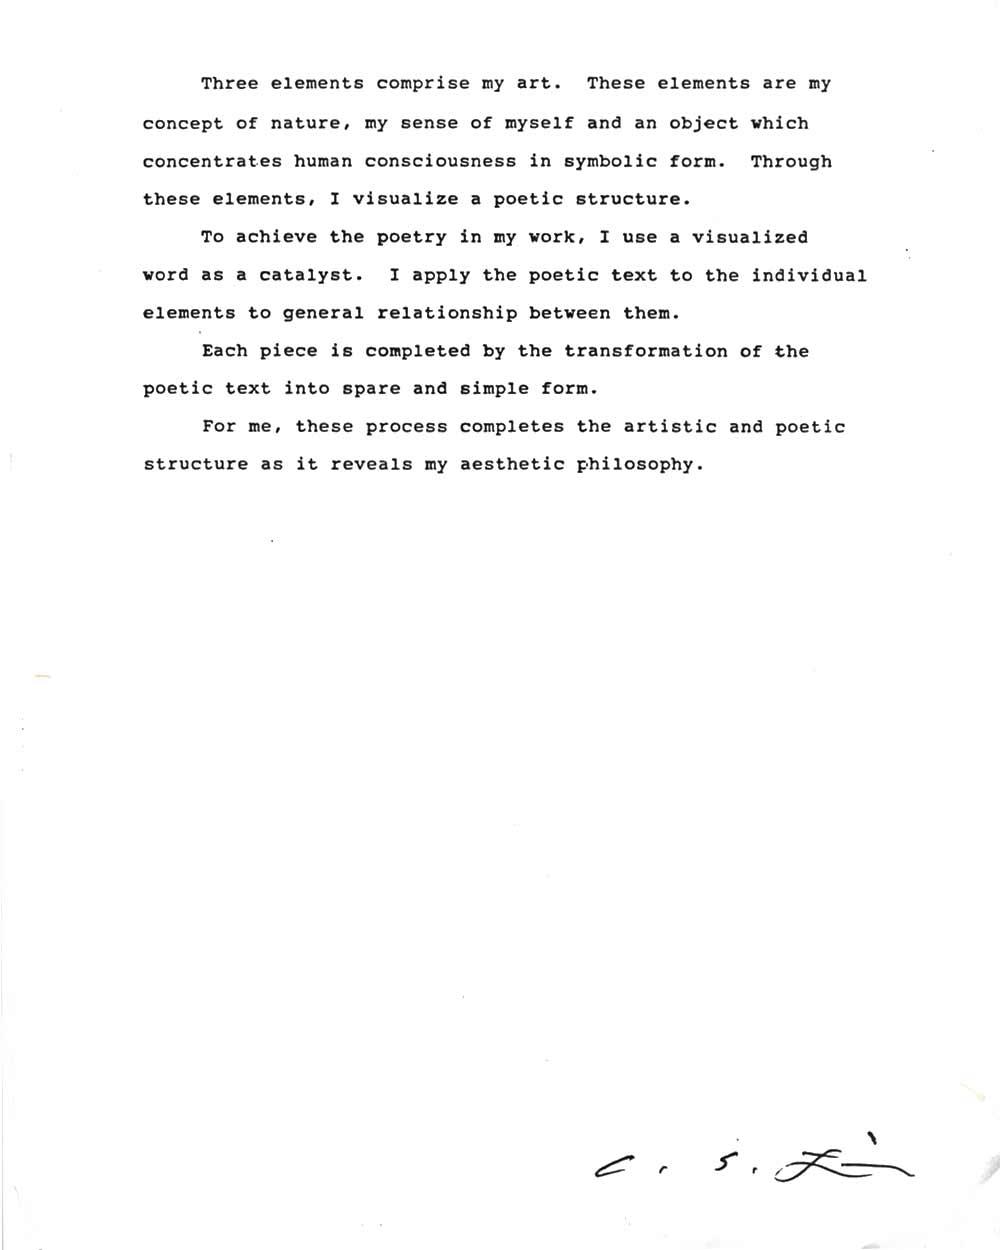 Choong Sup Lim's Artist Statement, pg 2